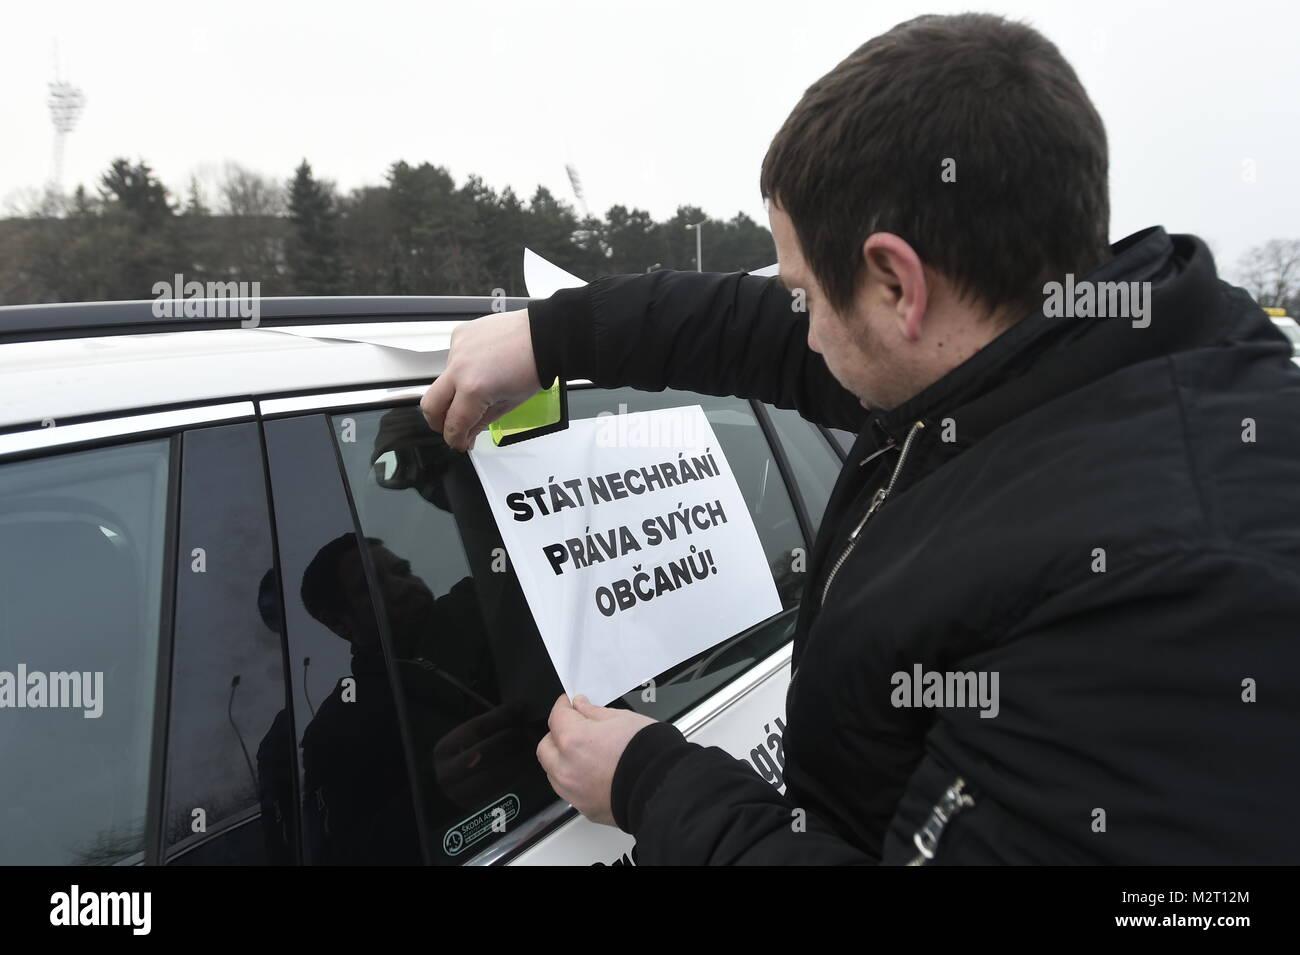 Zhezh Taxi